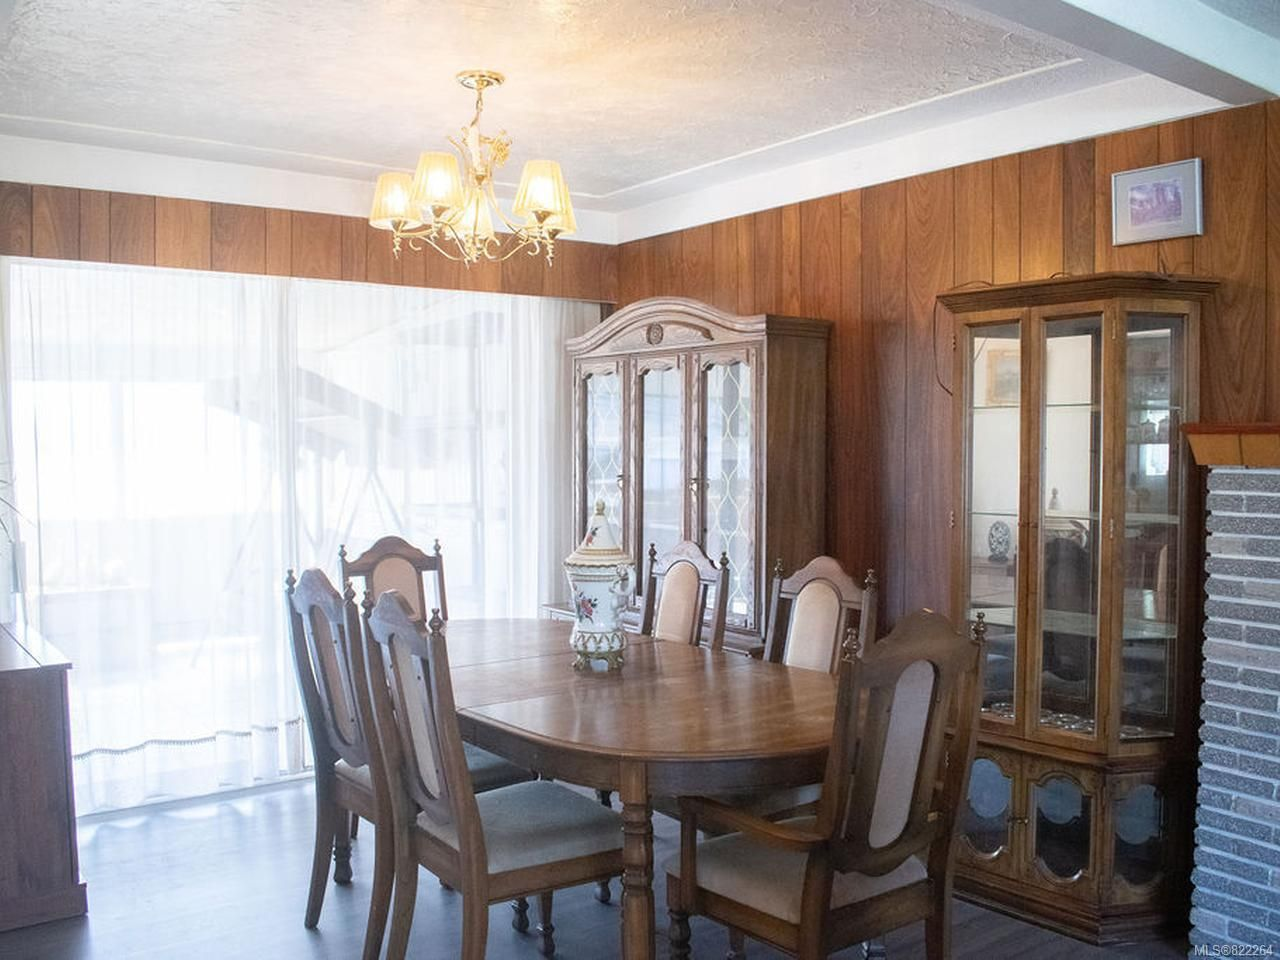 Photo 4: Photos: 4150 Rex Rd in PORT ALBERNI: PA Port Alberni House for sale (Port Alberni)  : MLS®# 822264